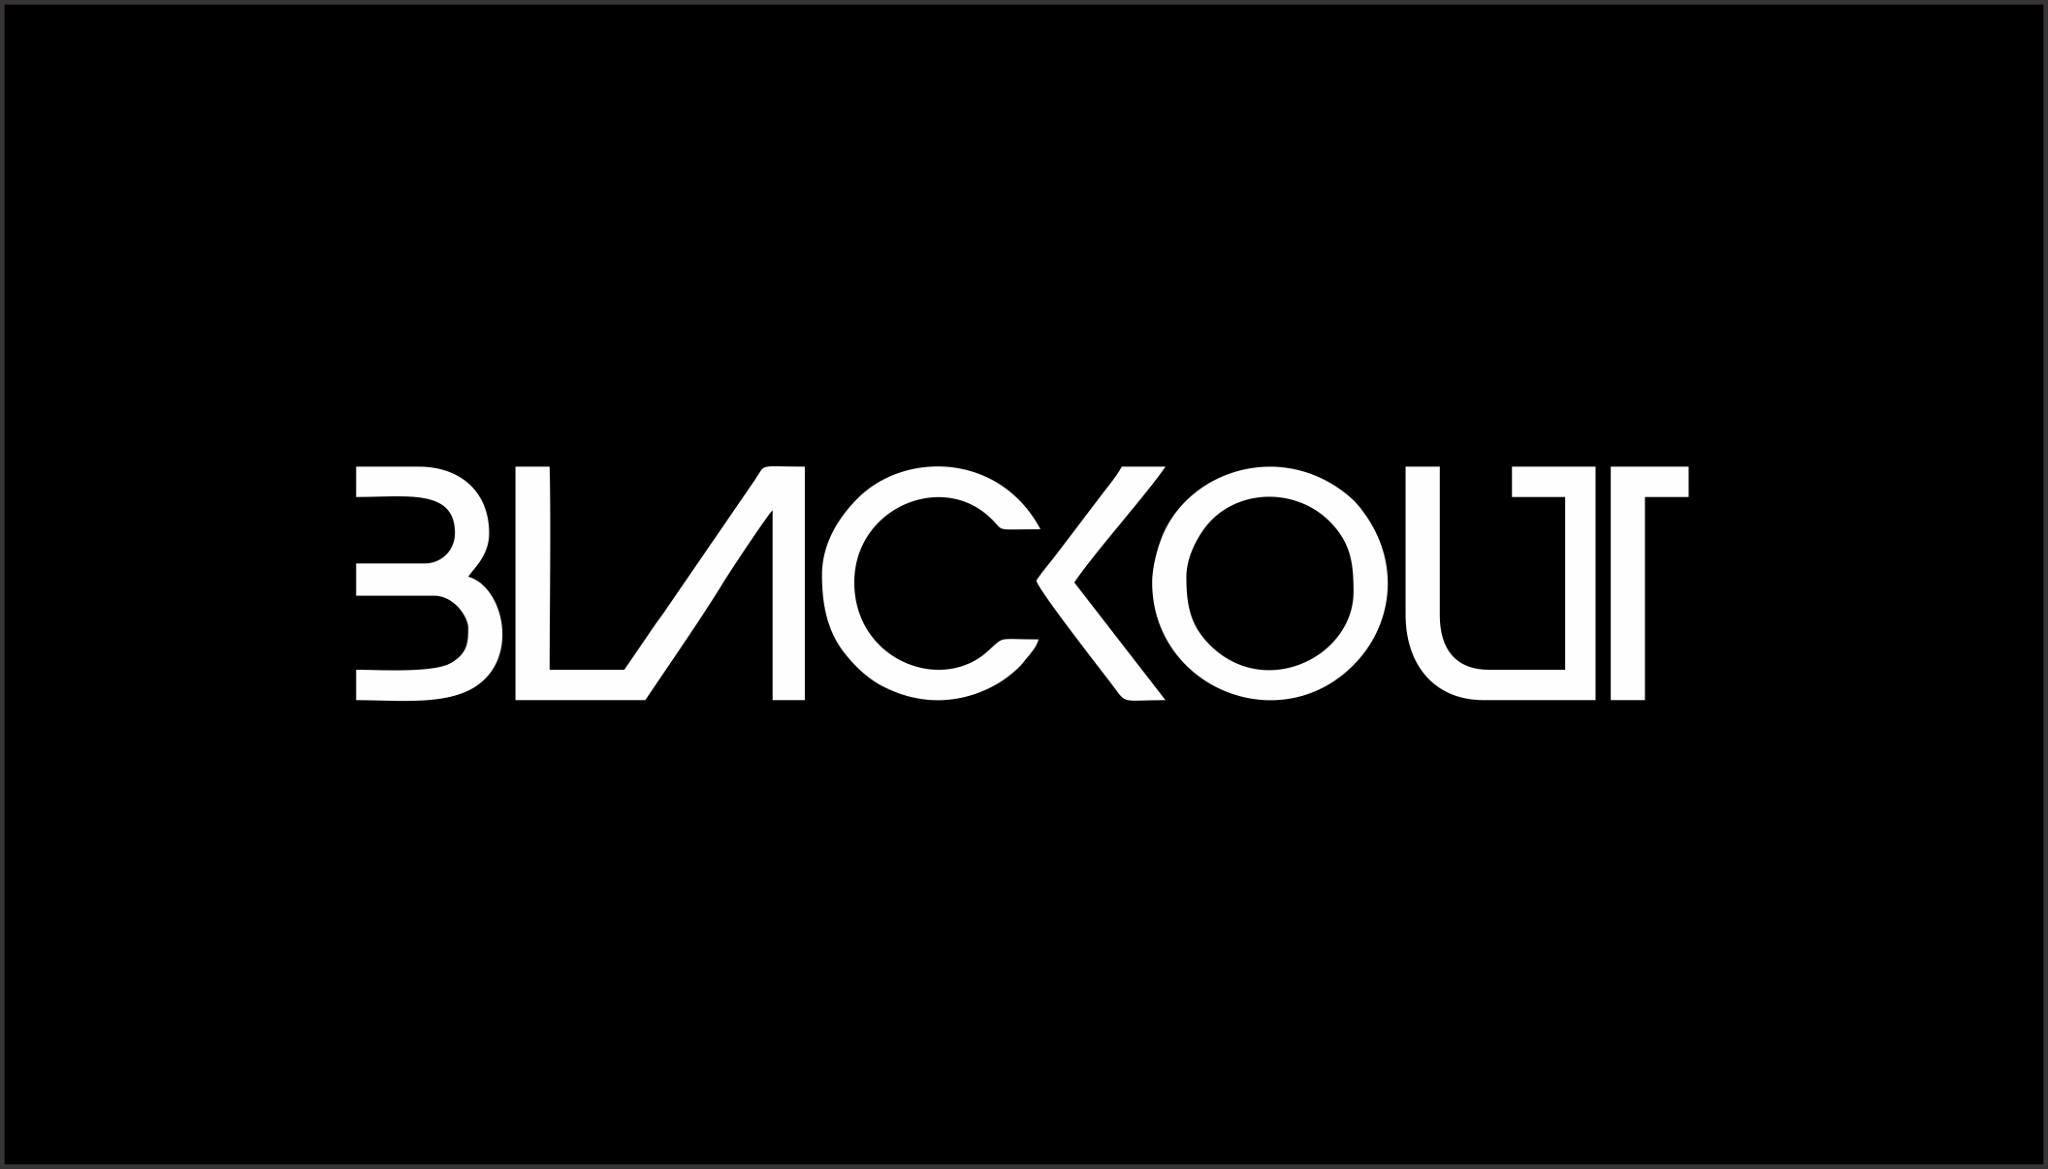 Blackout-logo.jpg